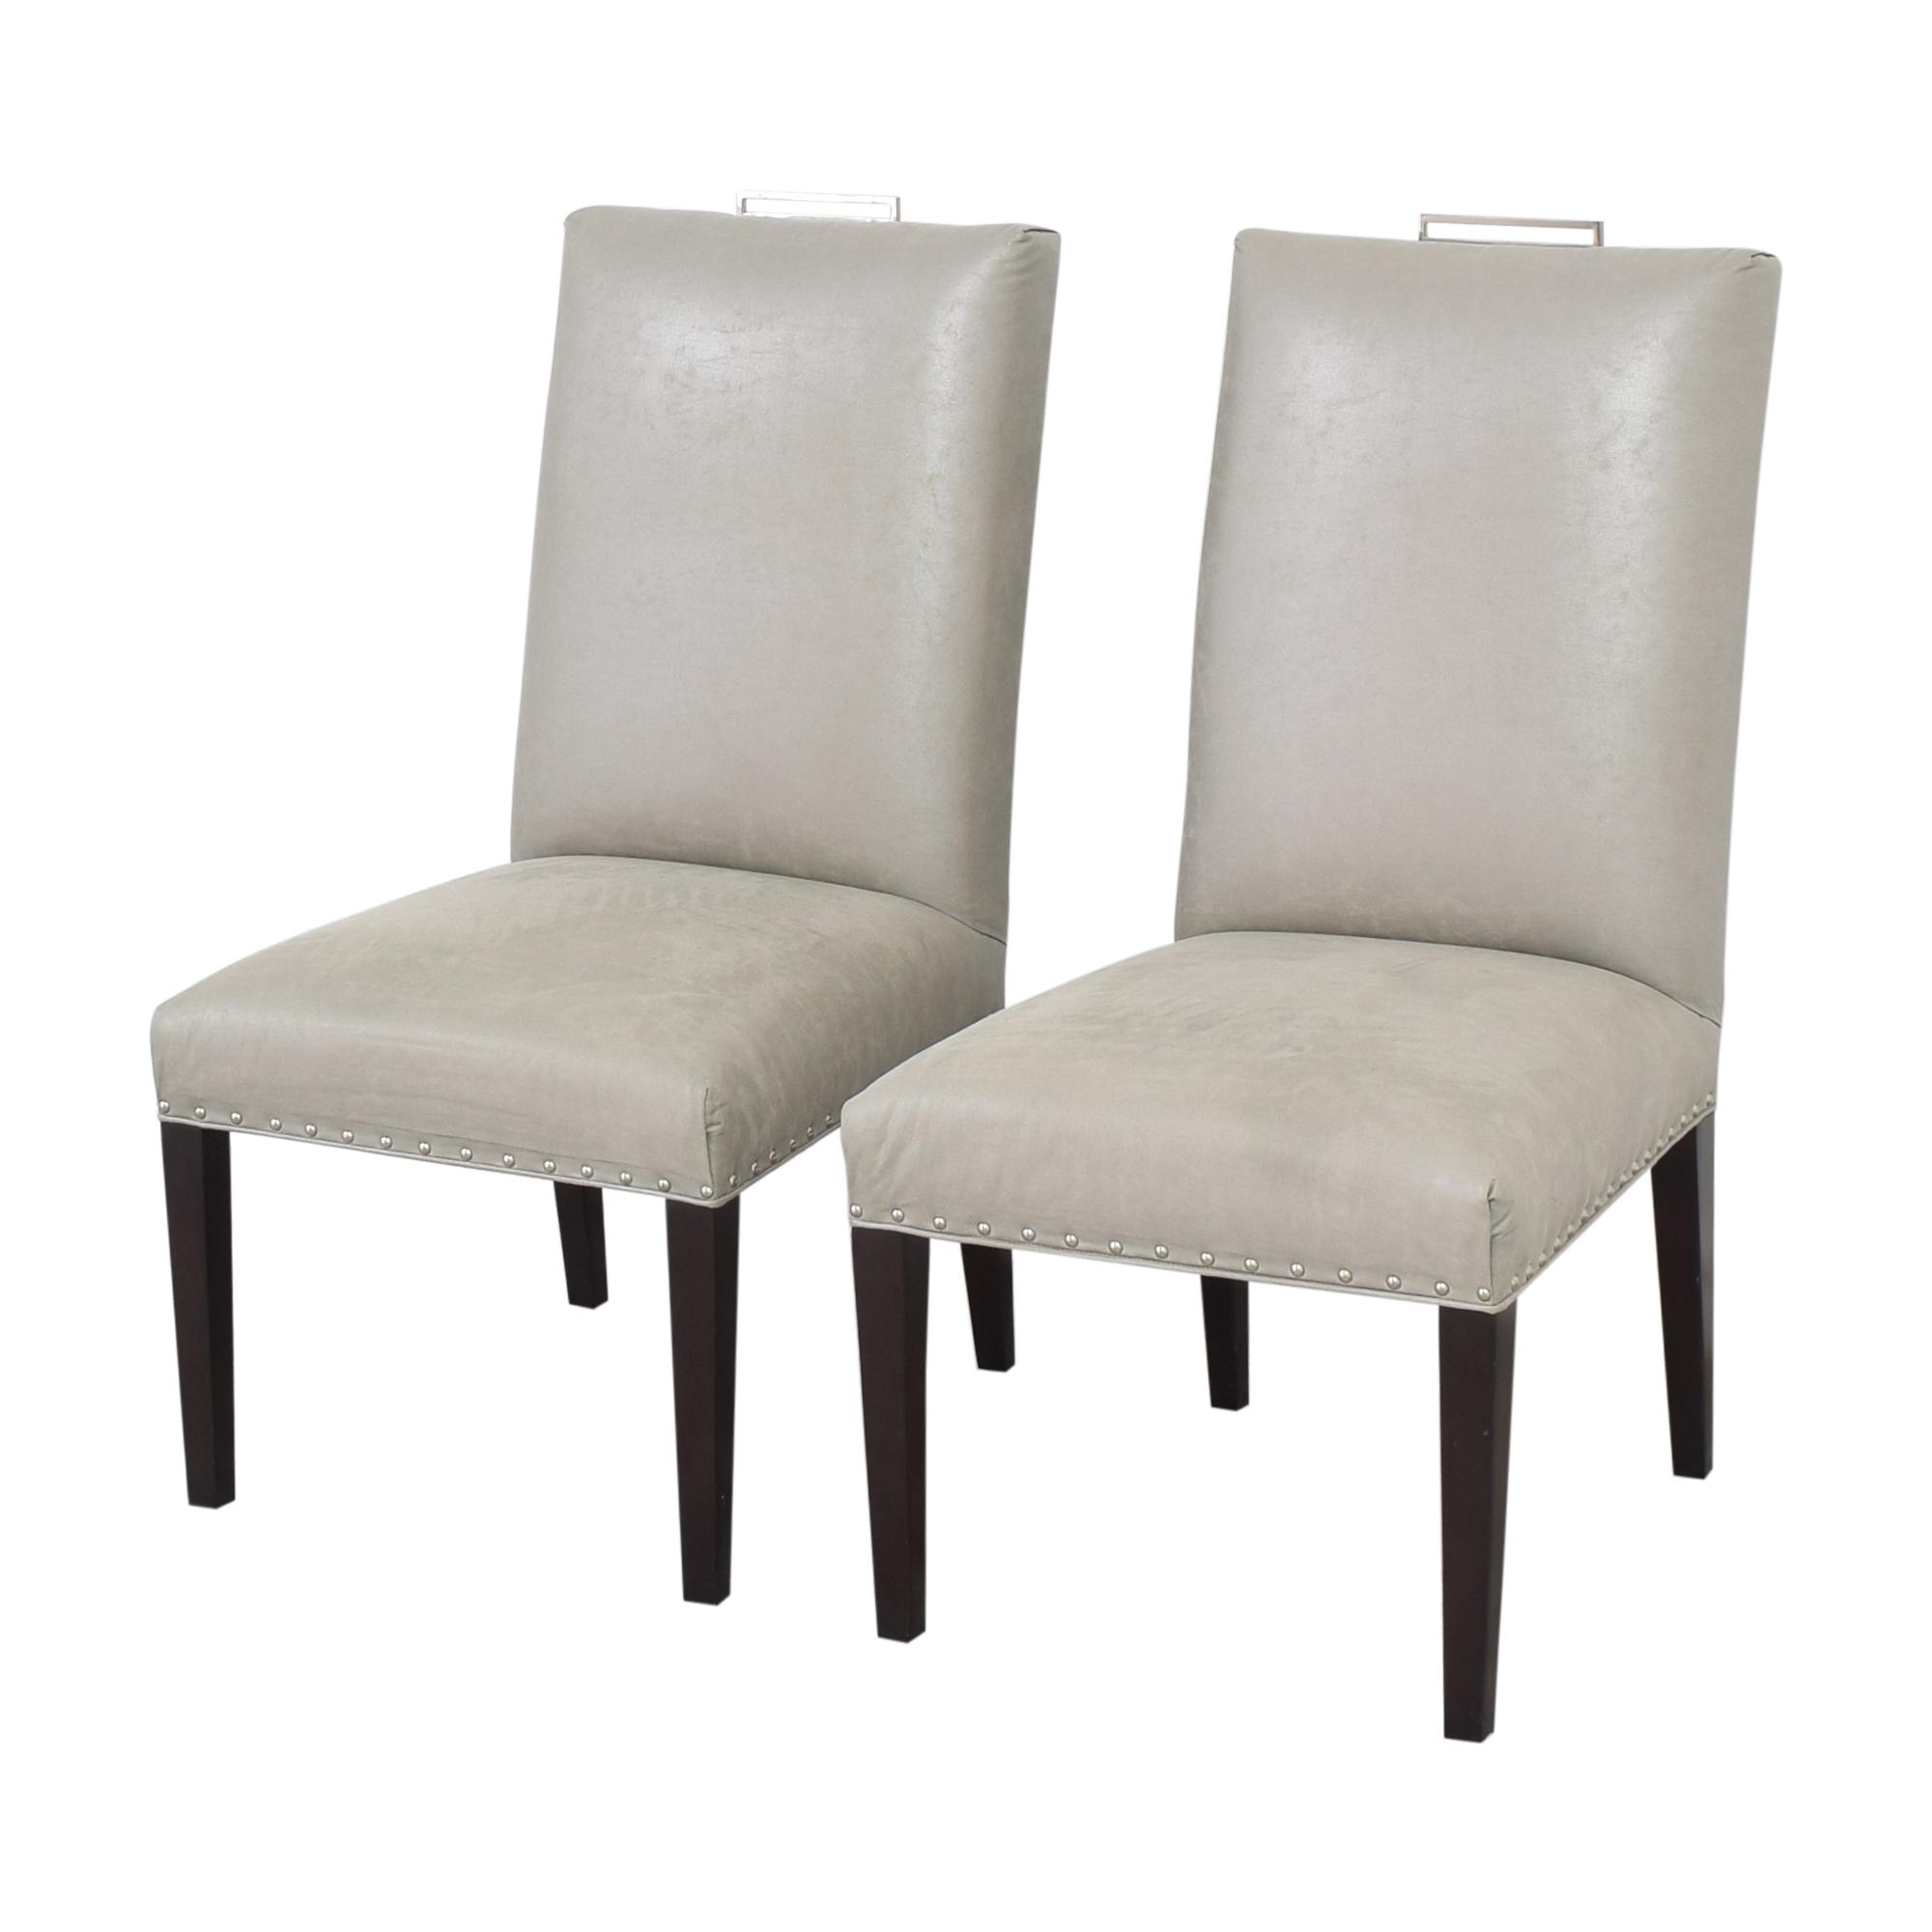 Vanguard Furniture Vanguard Michael Weiss Everhart Side Dining Chairs ma